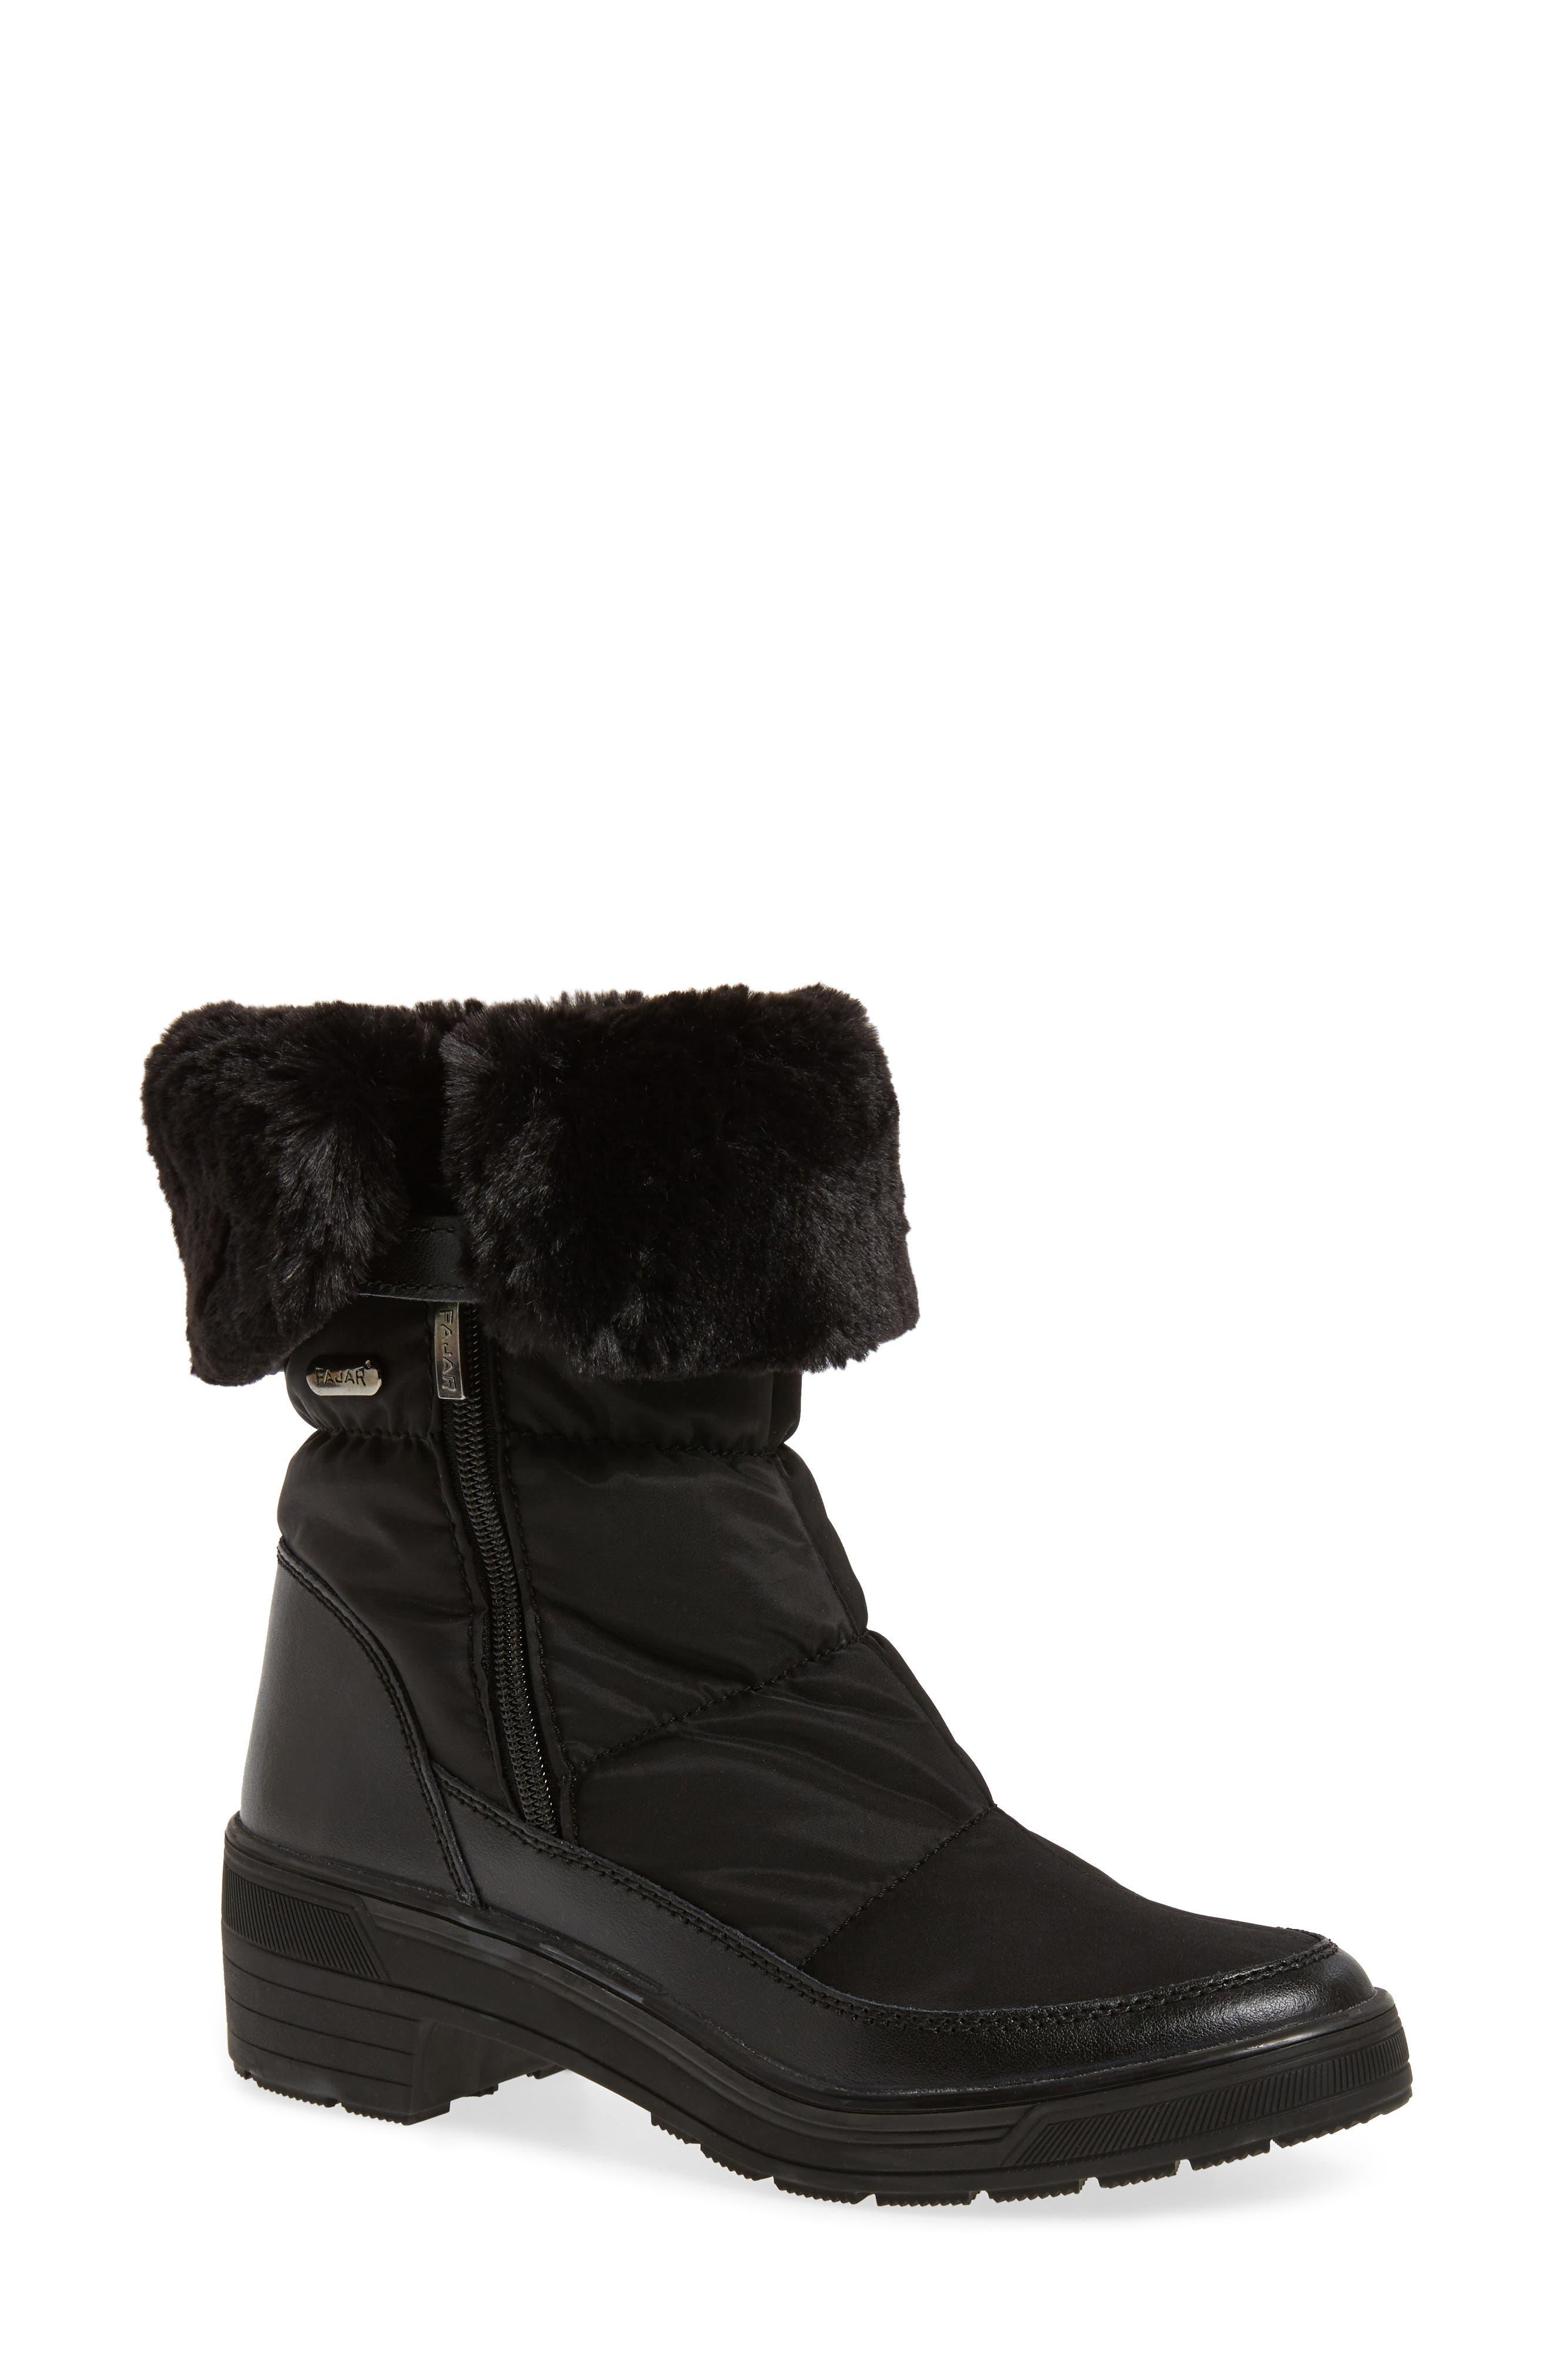 Ventura Weatherproof Faux Fur Lined Boot,                             Main thumbnail 1, color,                             001